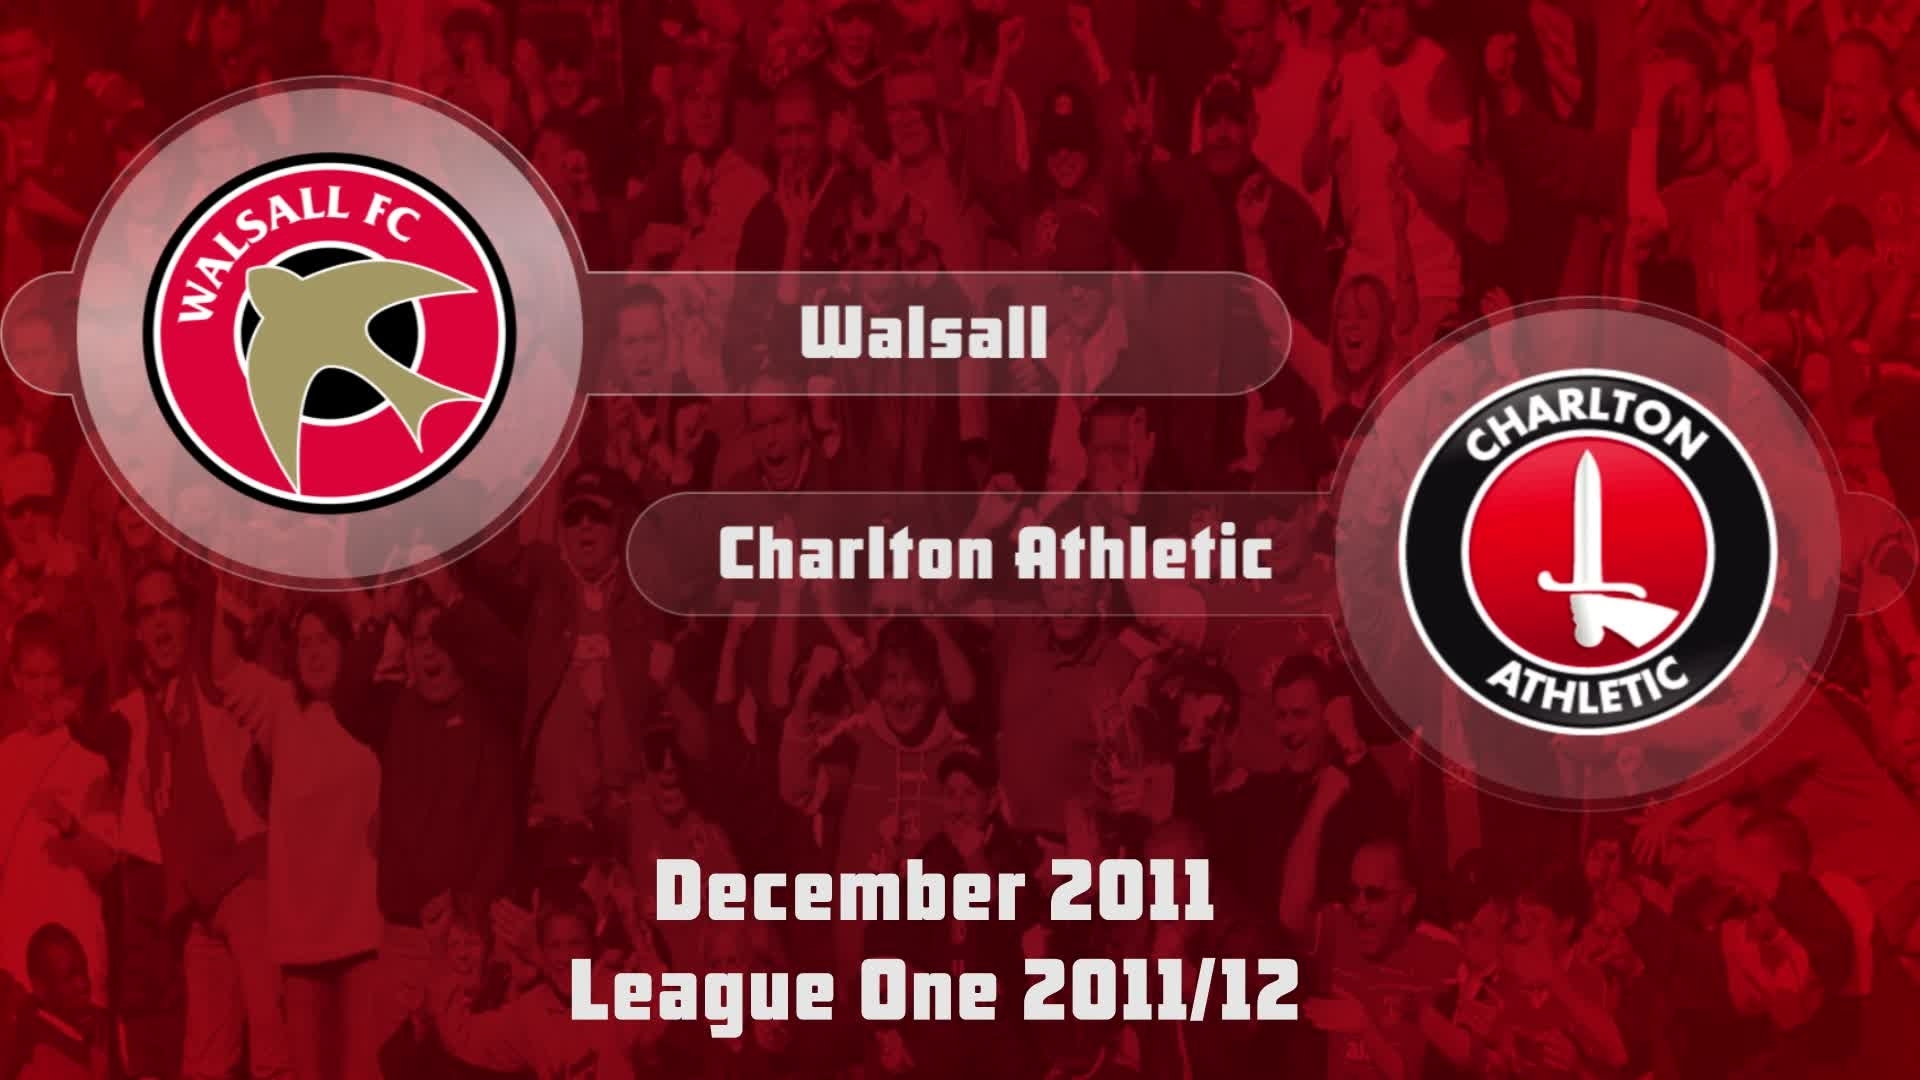 25 HIGHLIGHTS | Walsall 1 Charlton 1 (Dec 2011)